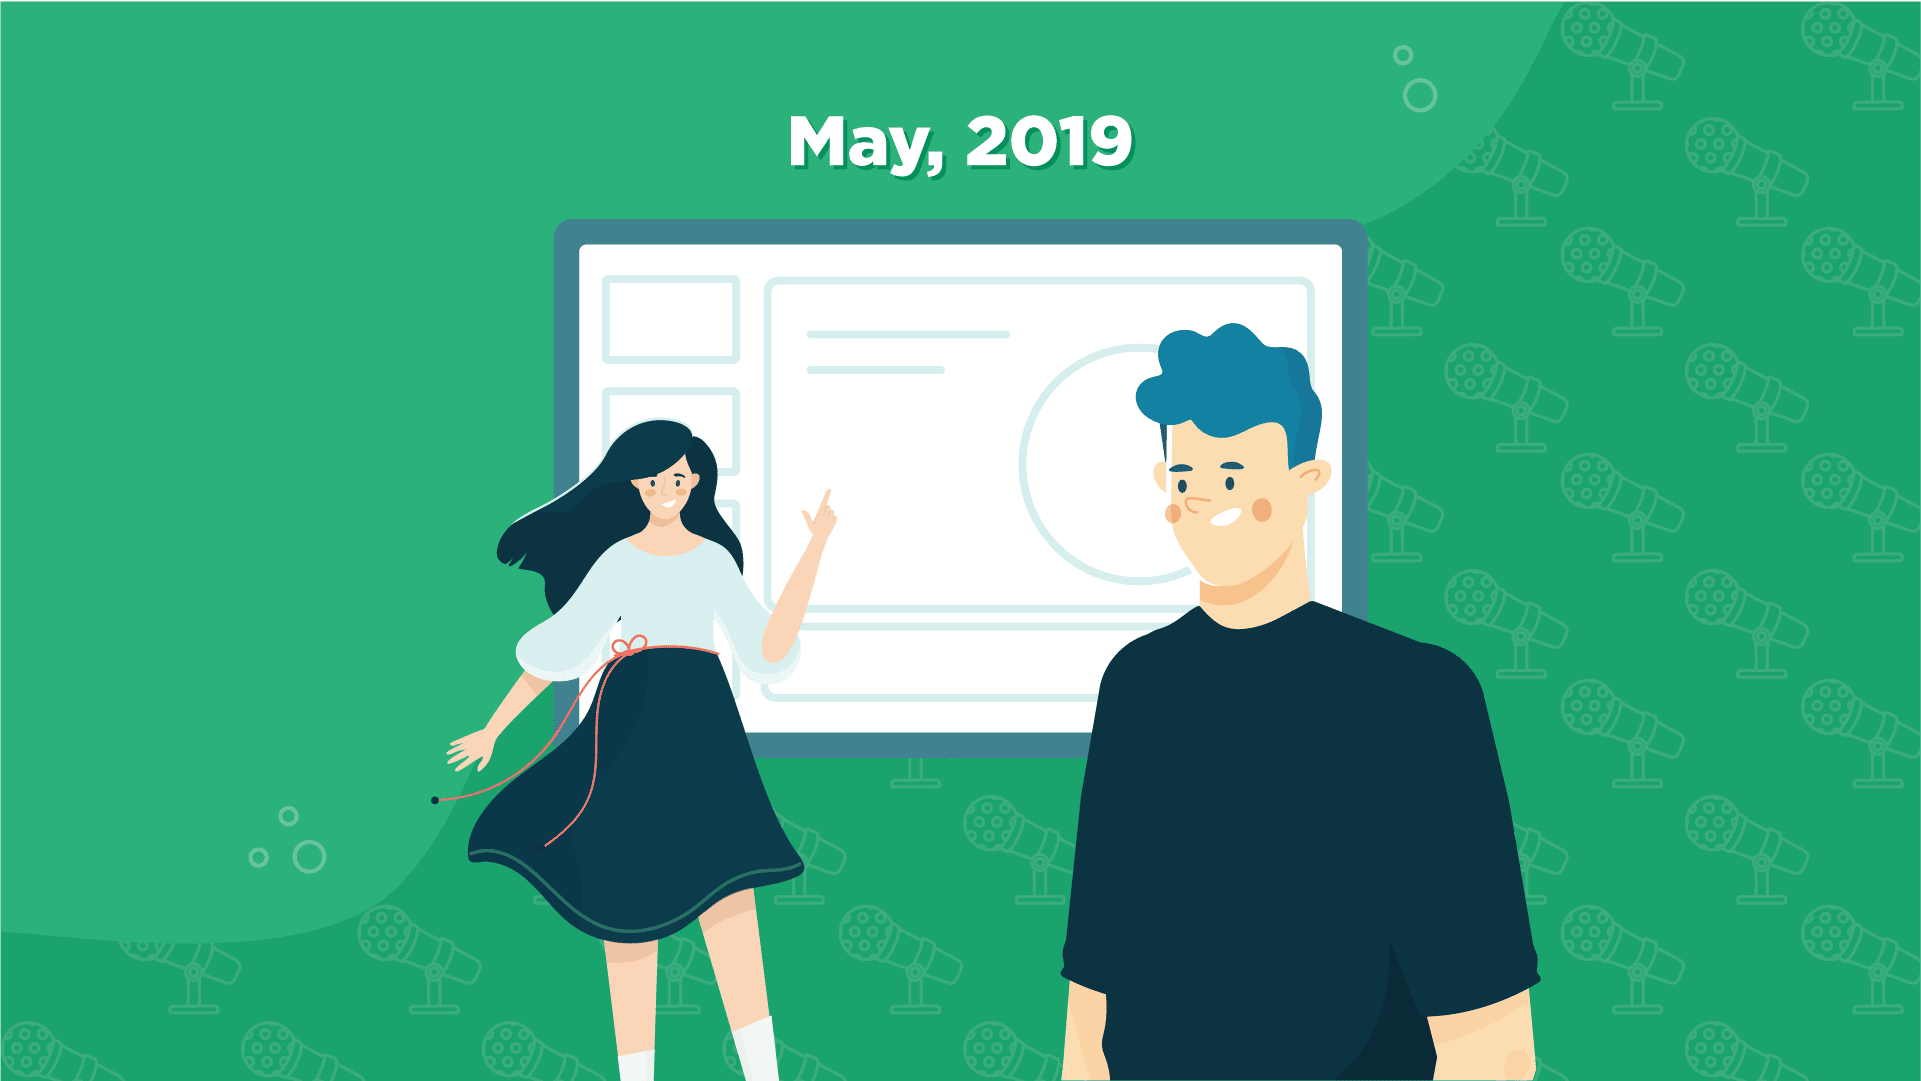 Public Speaking May 2019